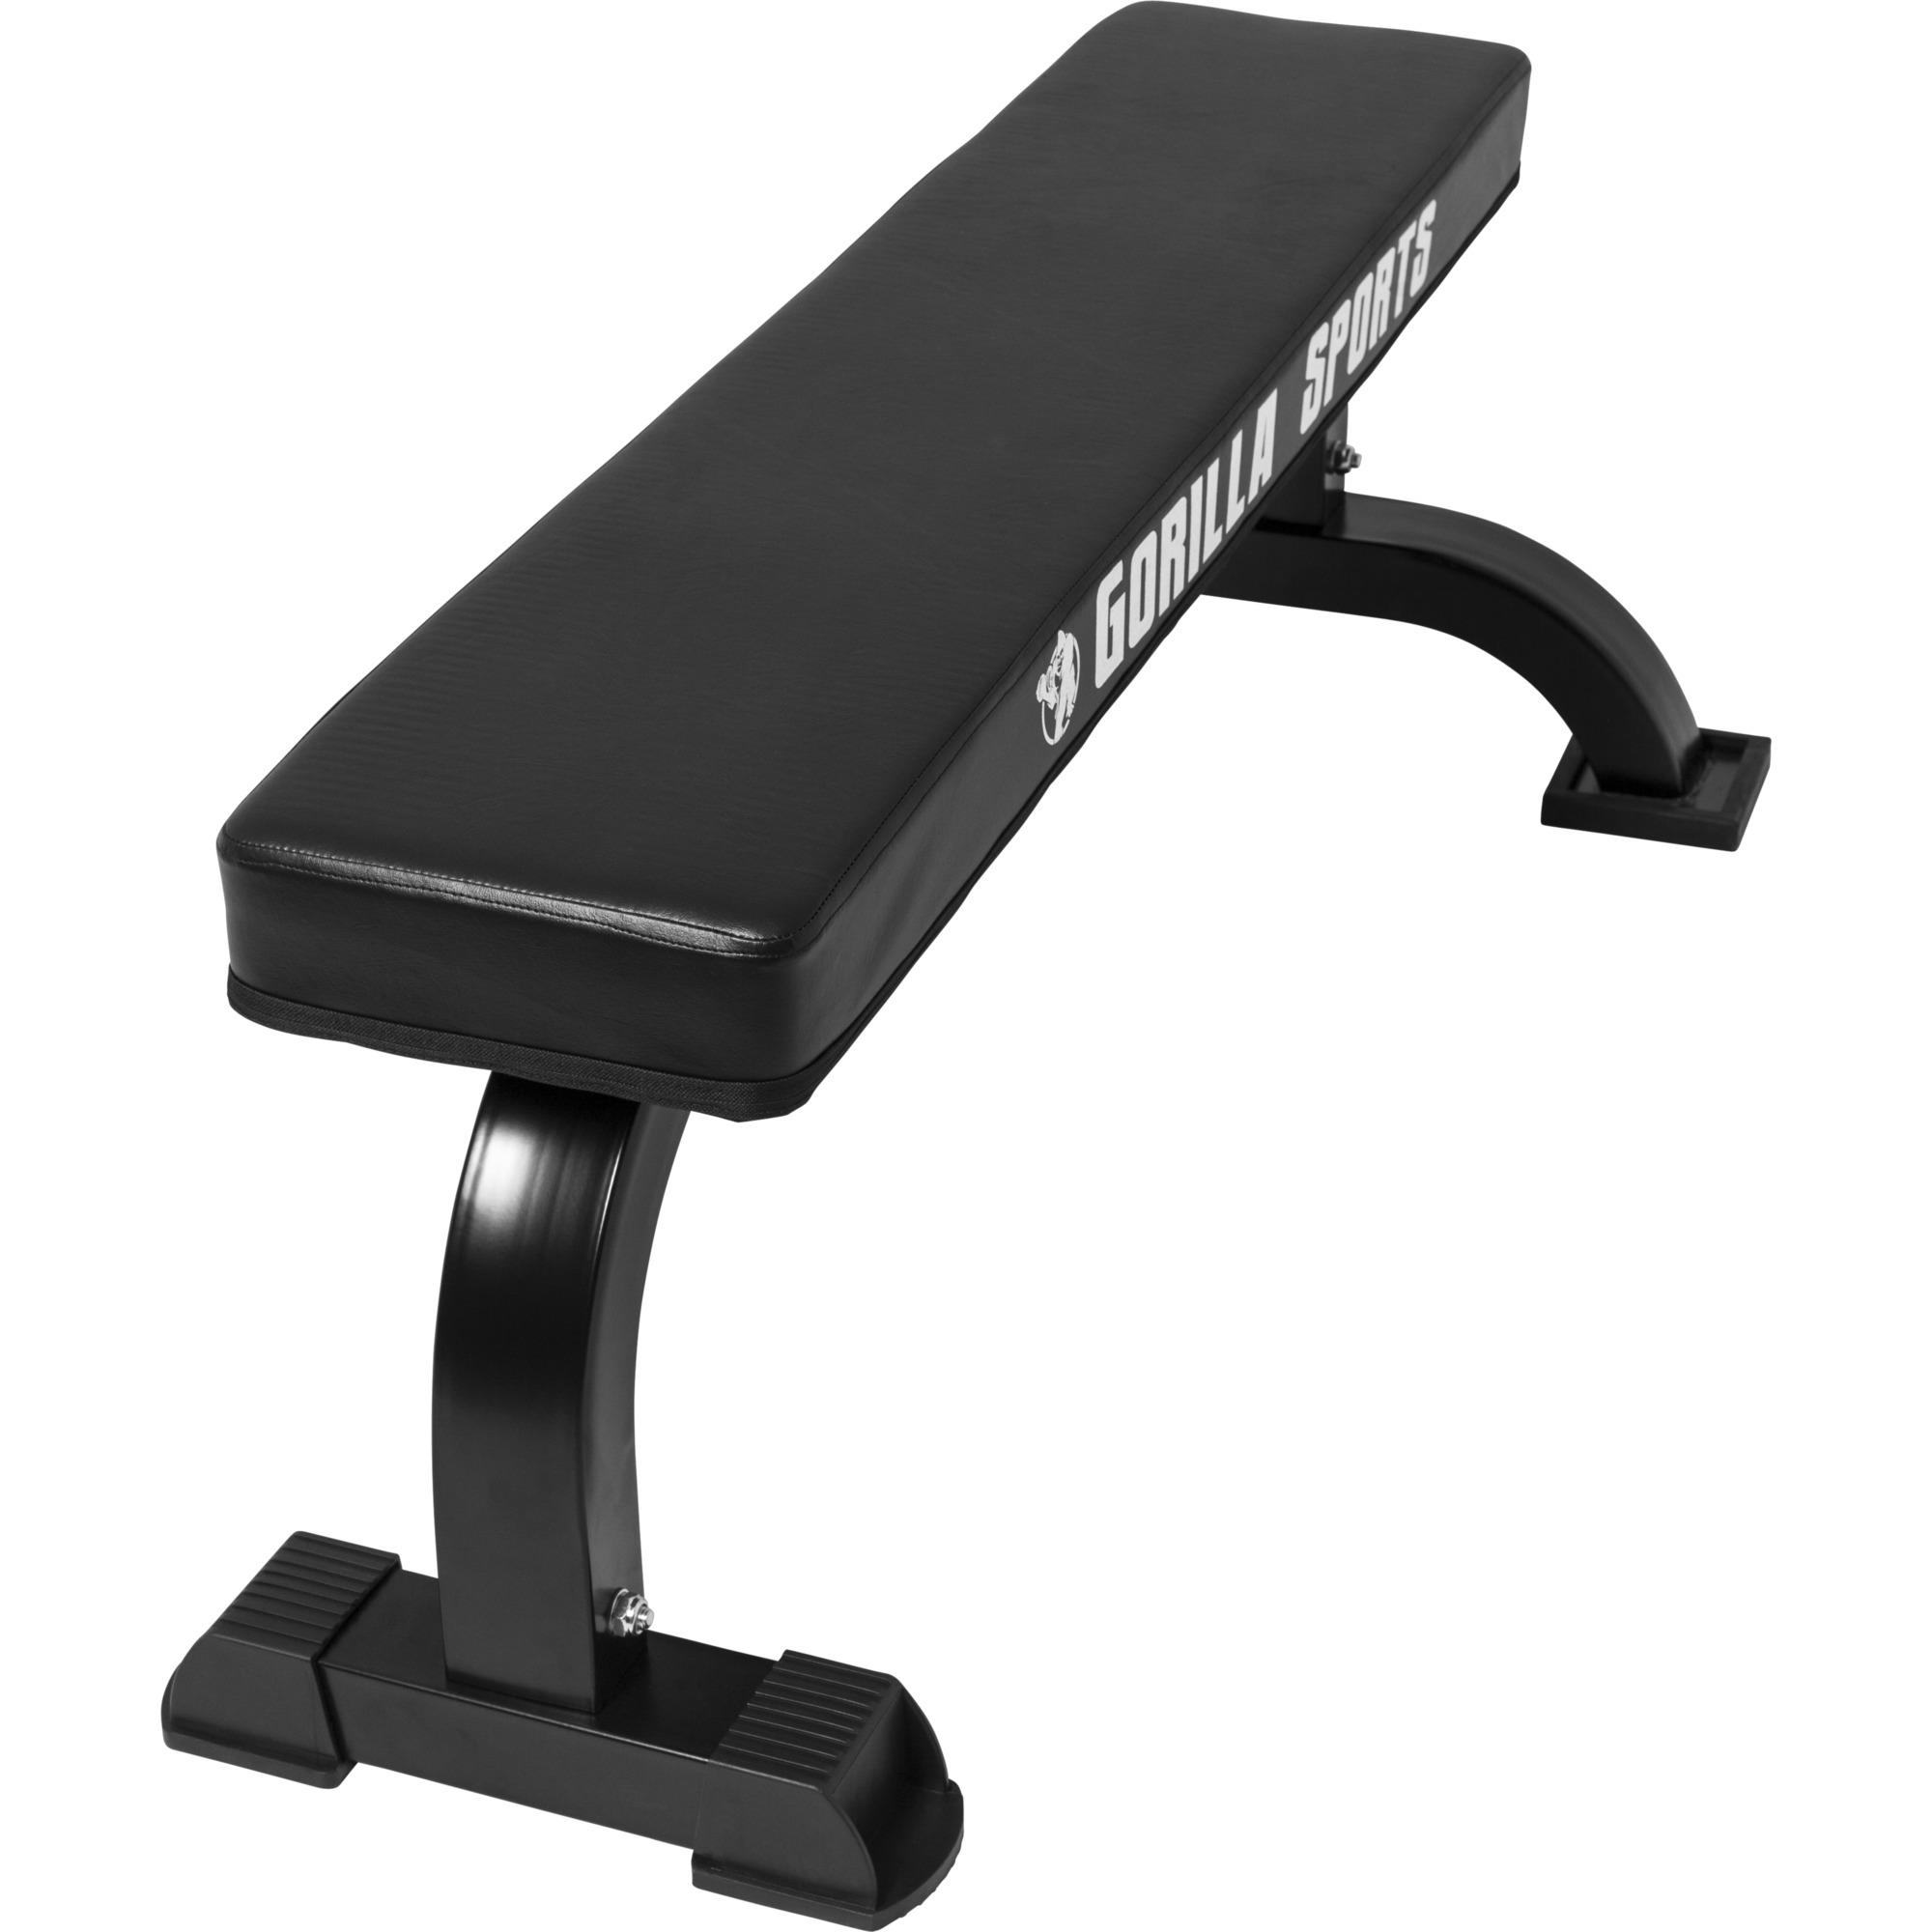 banc de musculation plat avec logo gorilla sports 100109 00045 0001. Black Bedroom Furniture Sets. Home Design Ideas